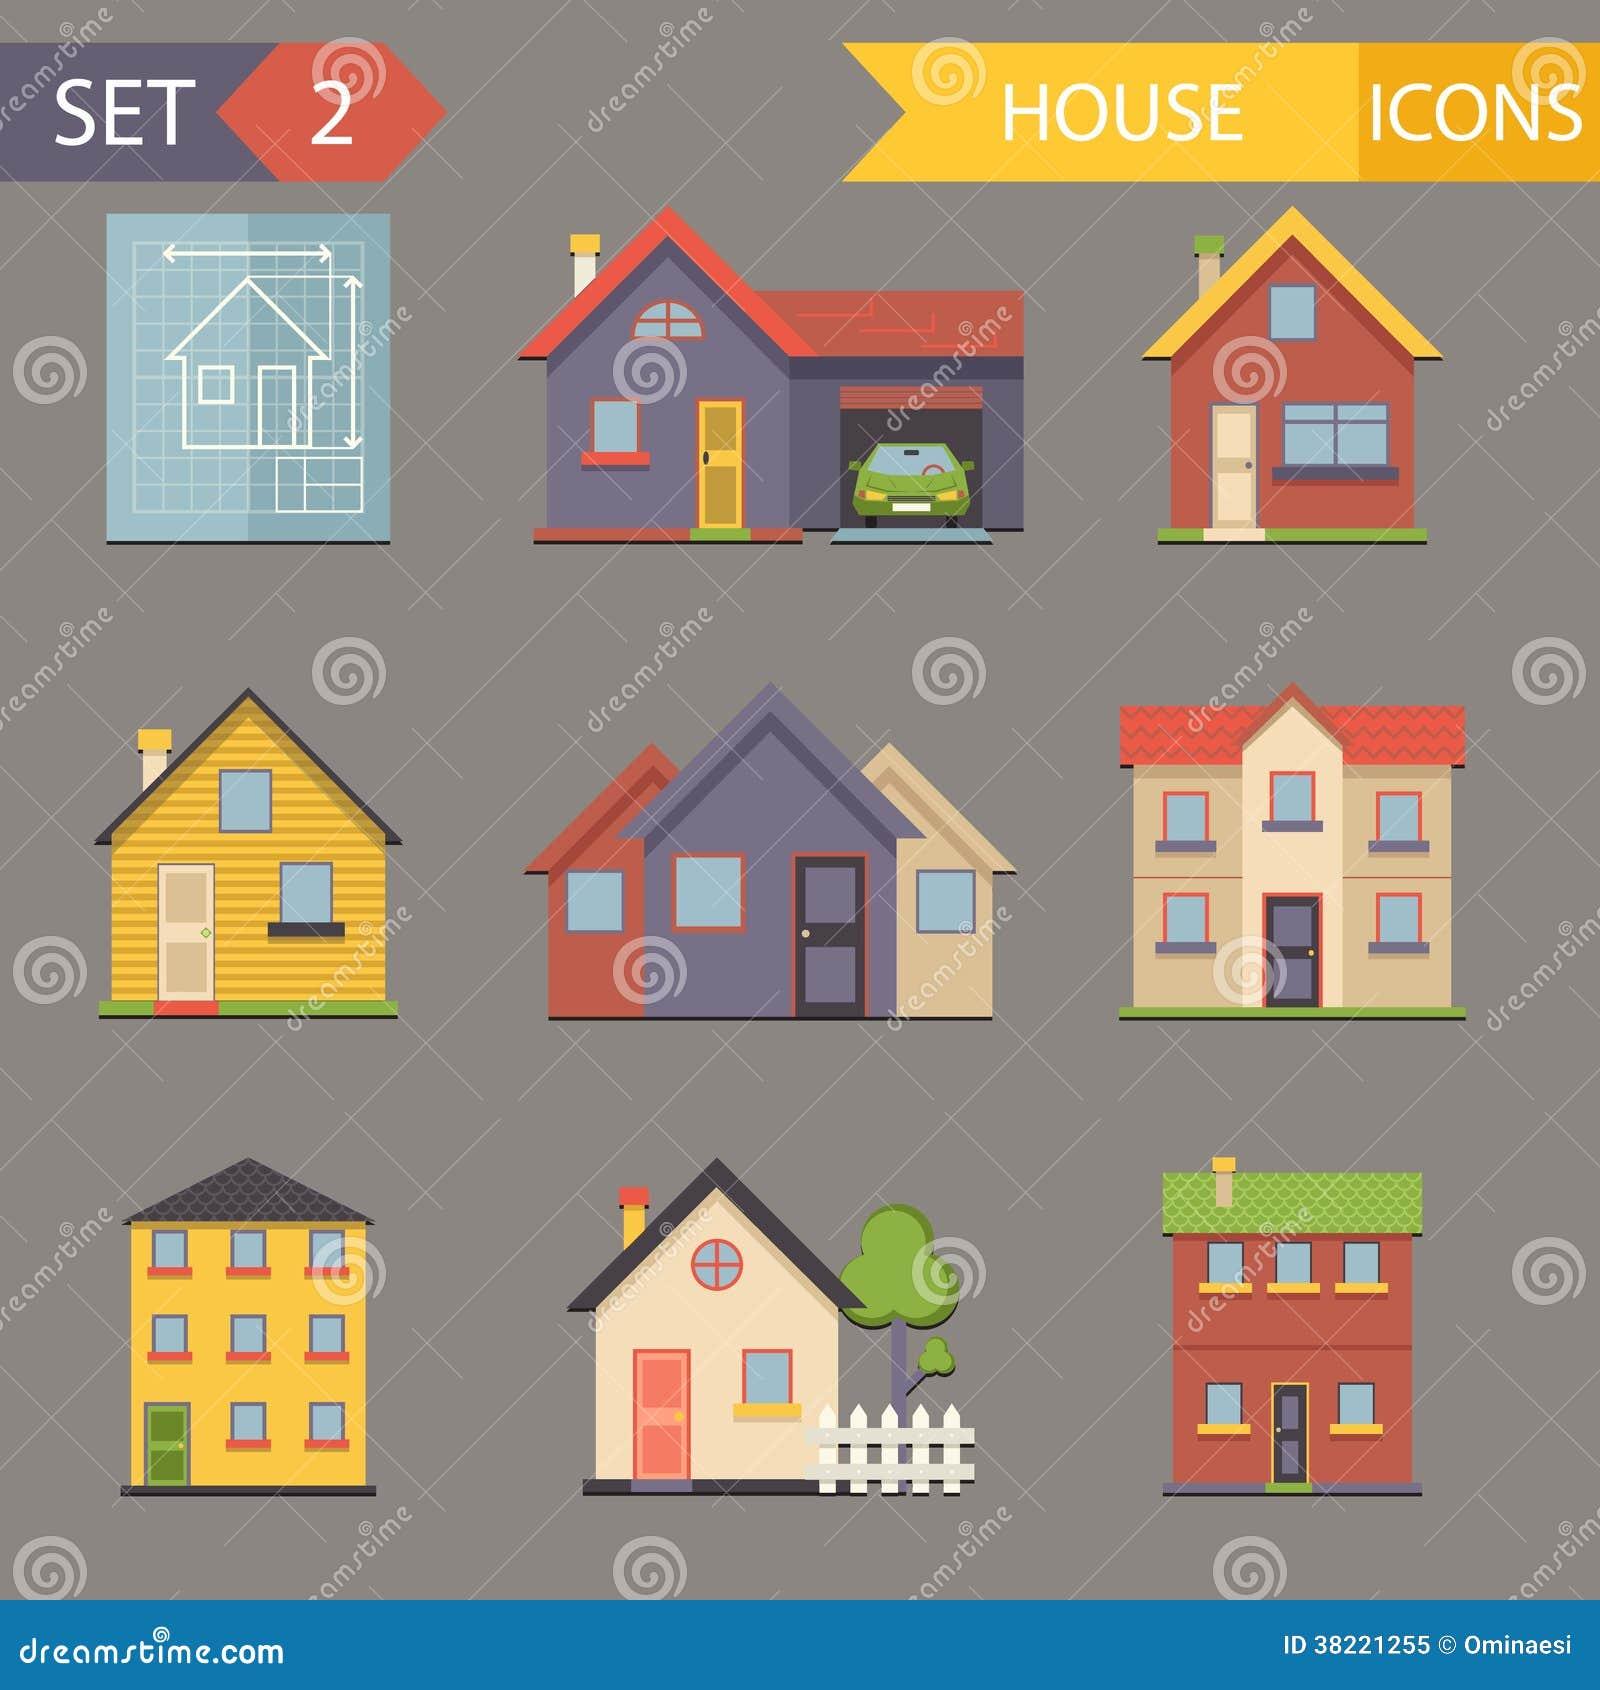 Retro Flat House Icons And Symbols Set Vector Royalty Free